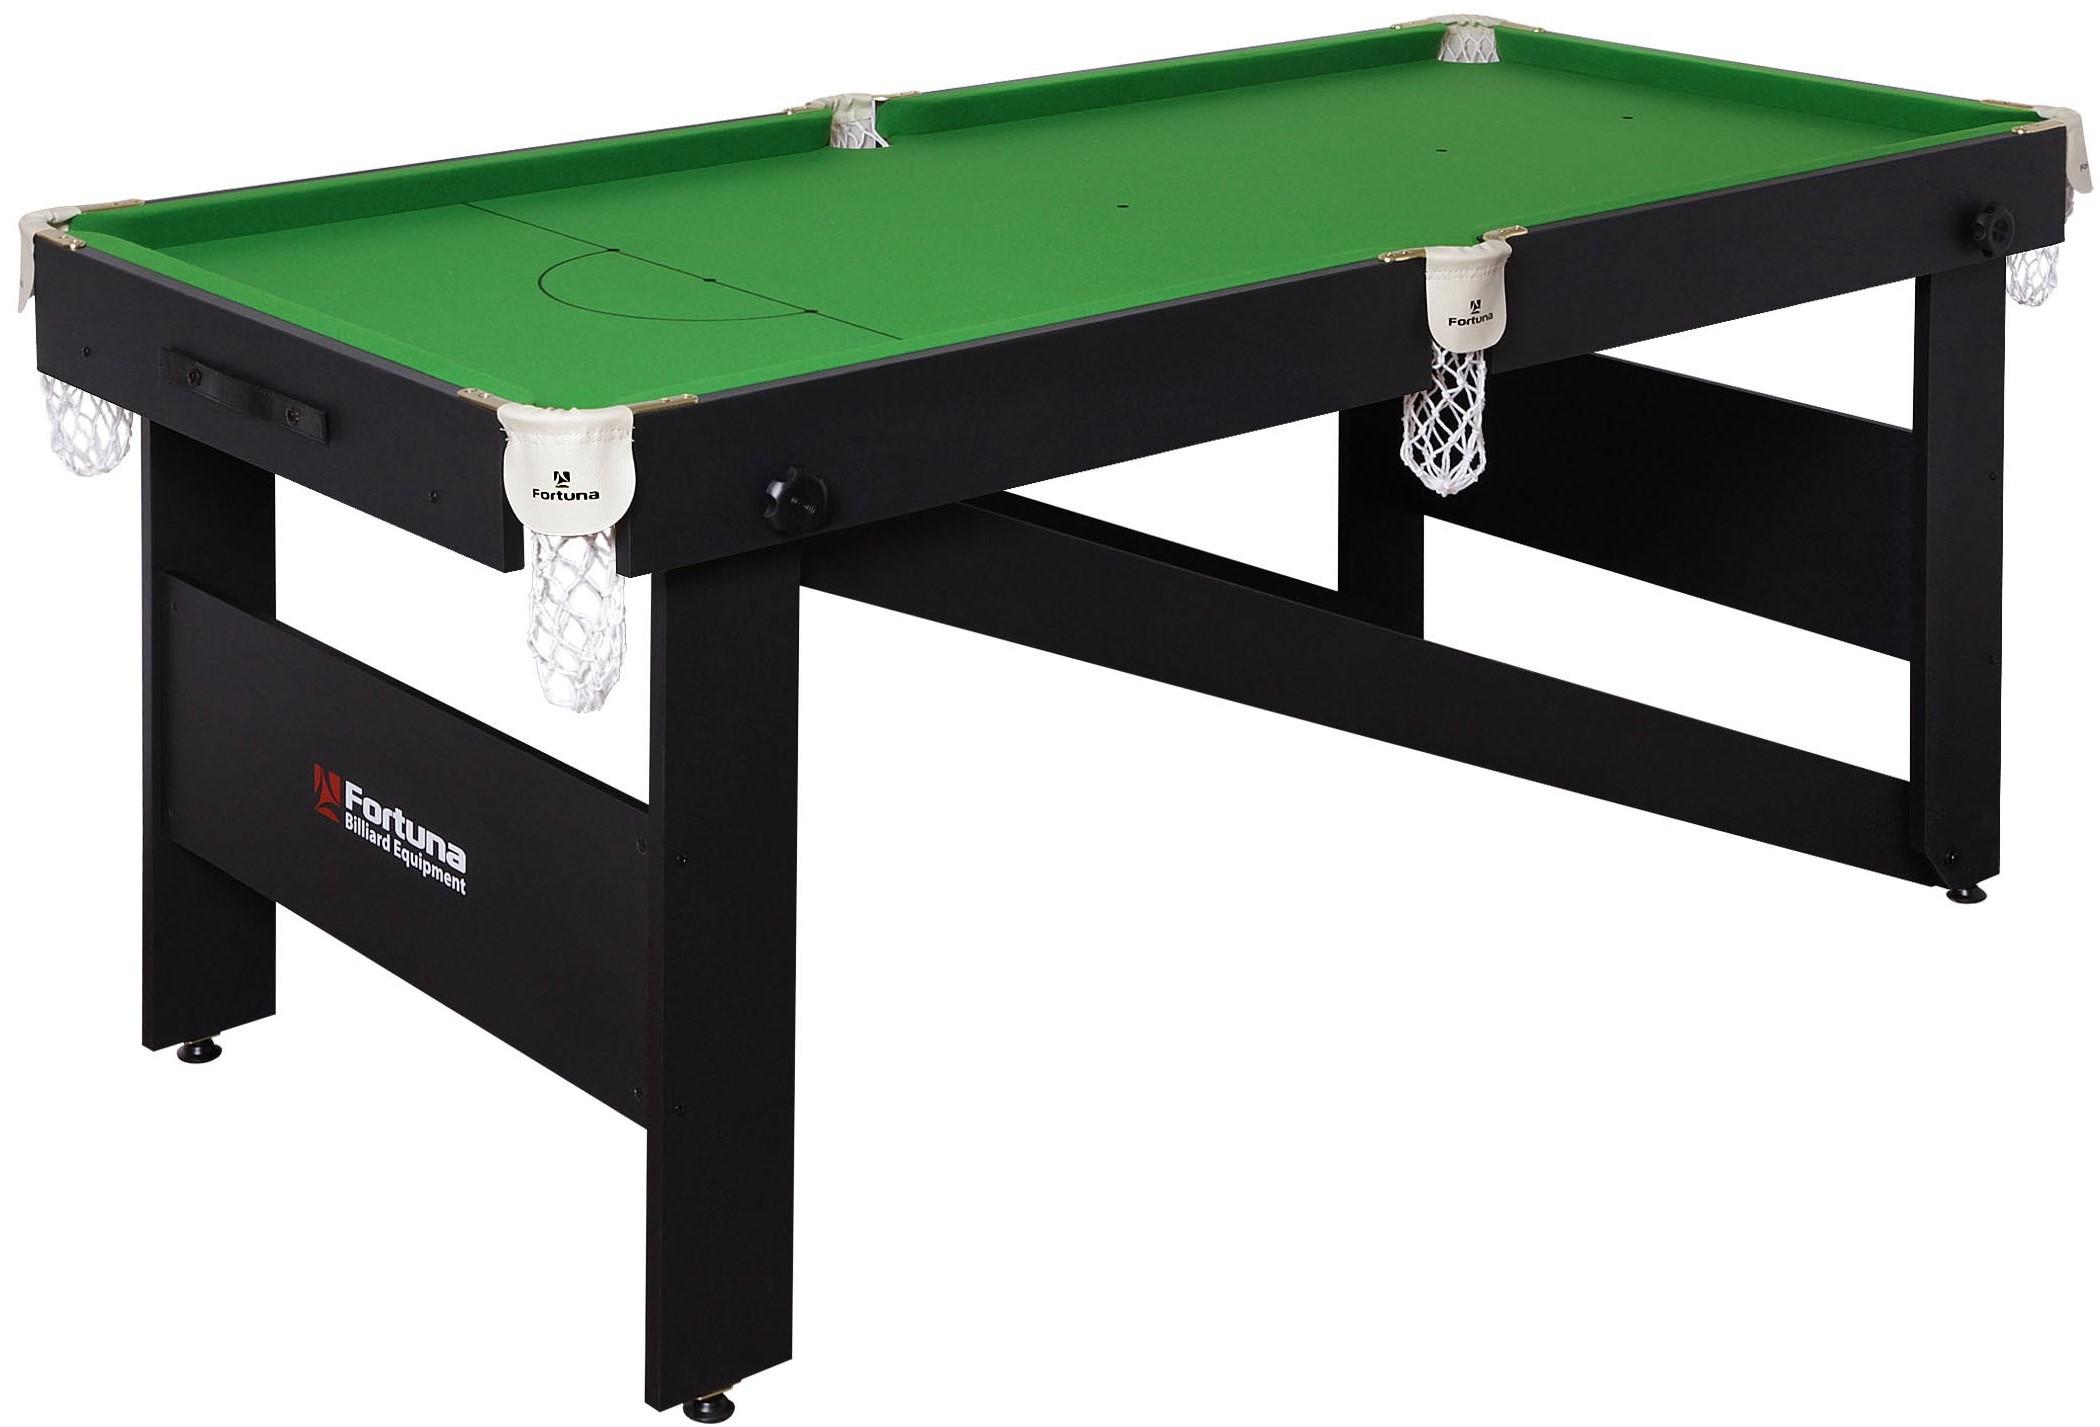 Бильярдный стол Fortuna Hobby BF-530S Cнукер 5FT